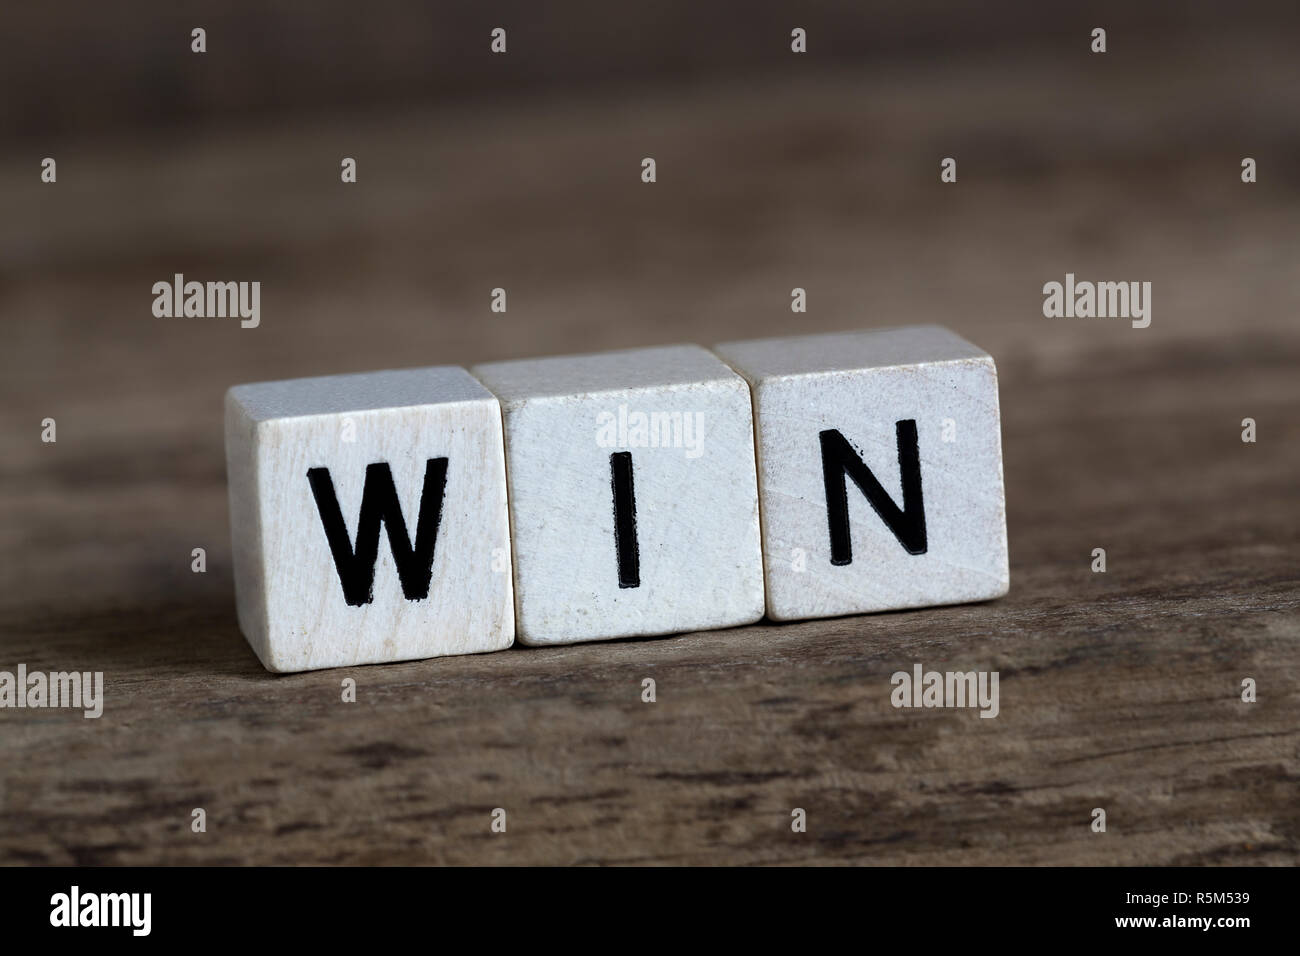 Win, written in cubes - Stock Image